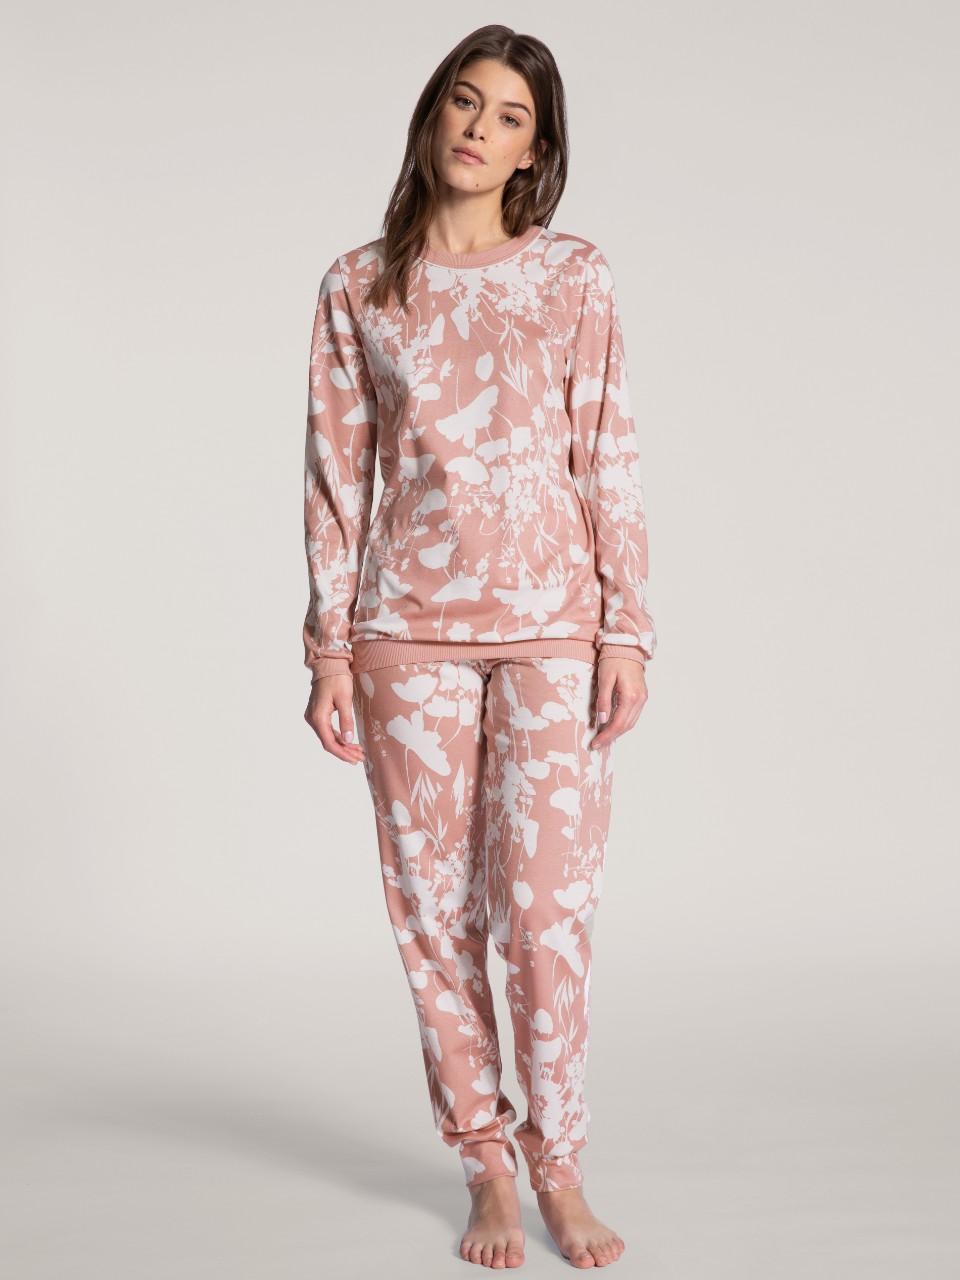 40585 pyjama 100% coton interlock Prix :79.95 €